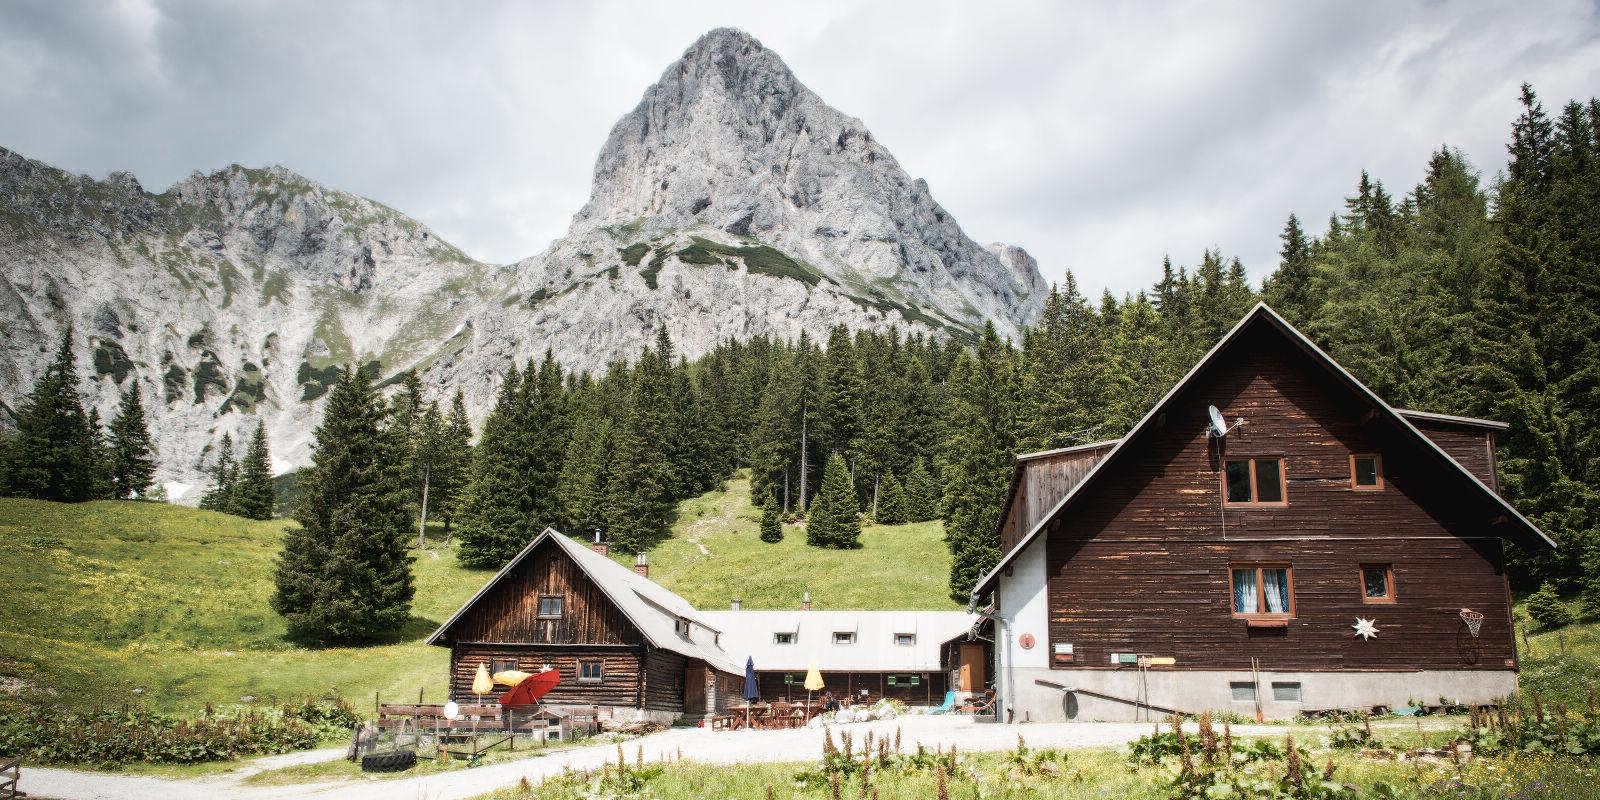 Klinke Hütte